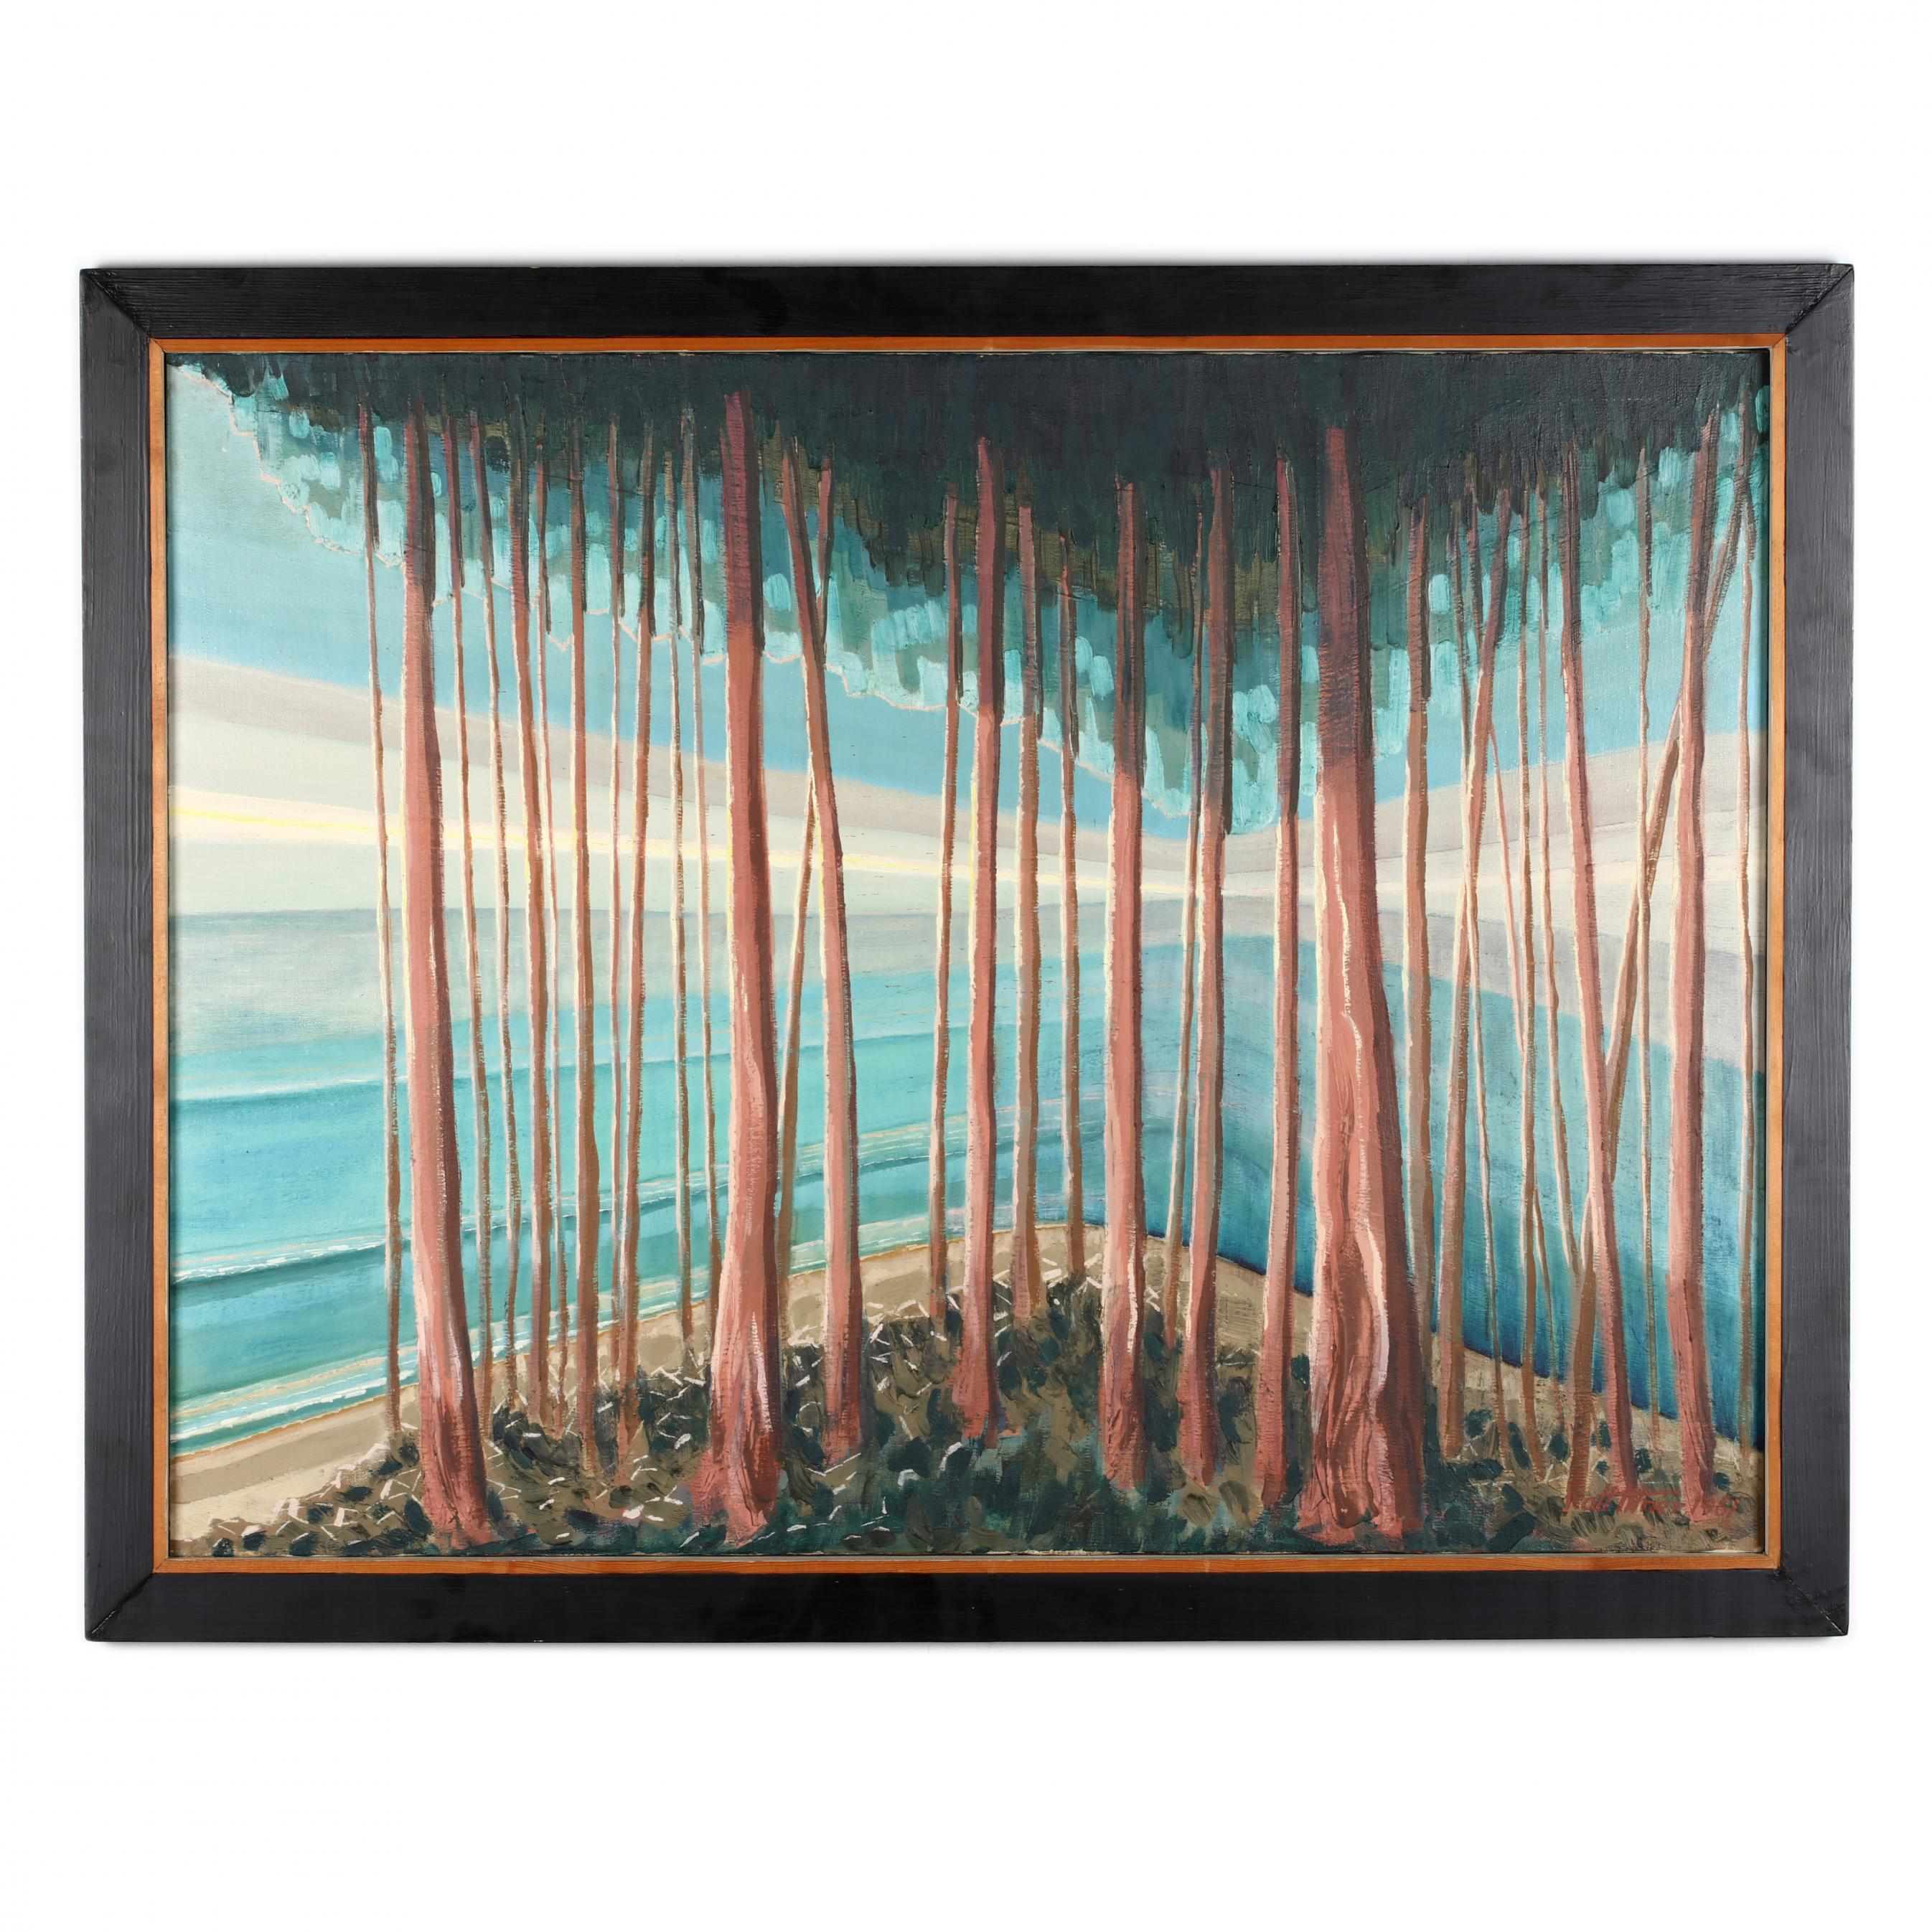 scott-ittner-mo-1902-1981-shoreline-vista